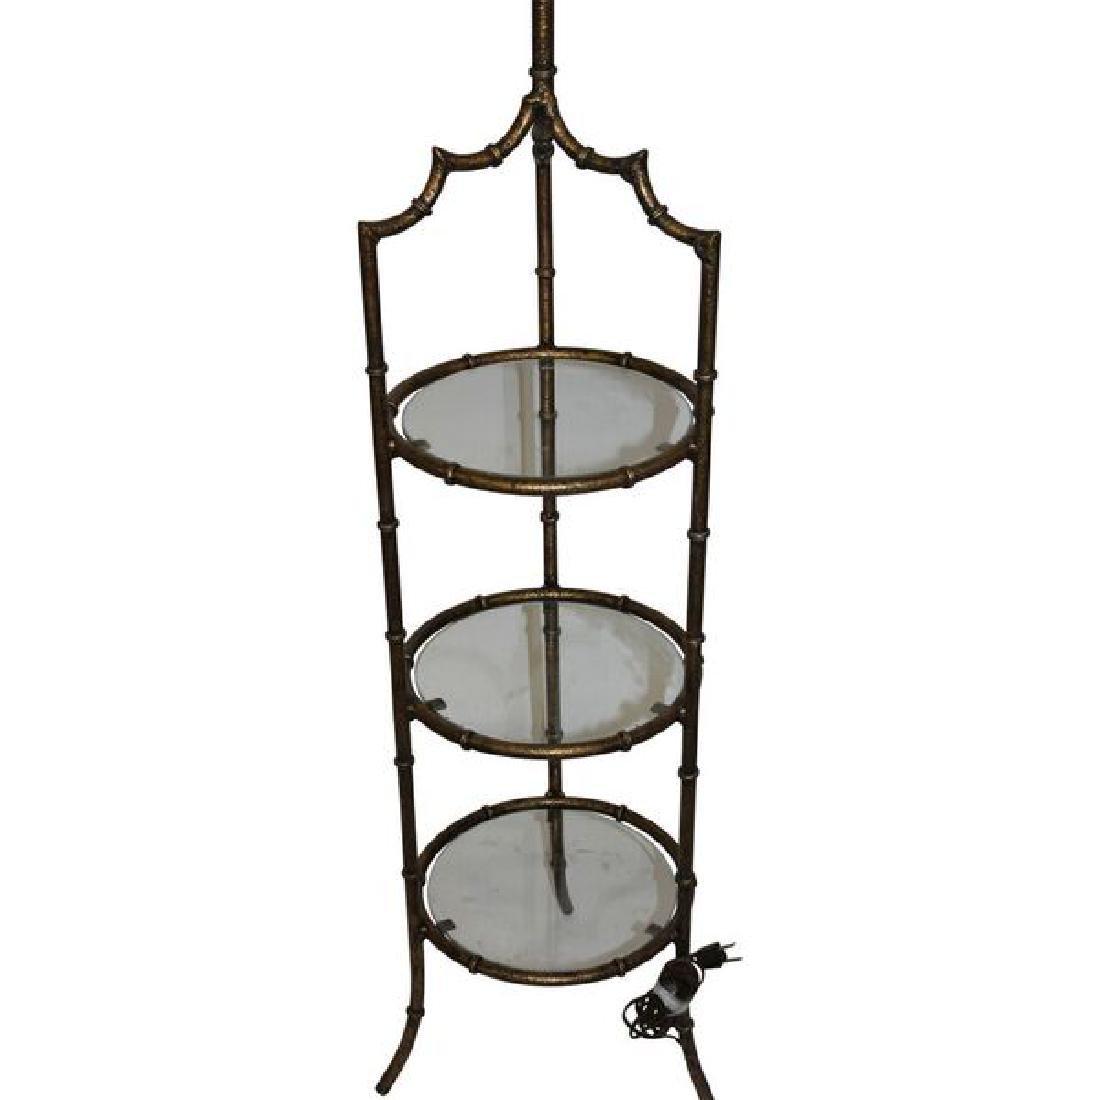 Mid Century Hollywood Regency Floor Lamps - 3